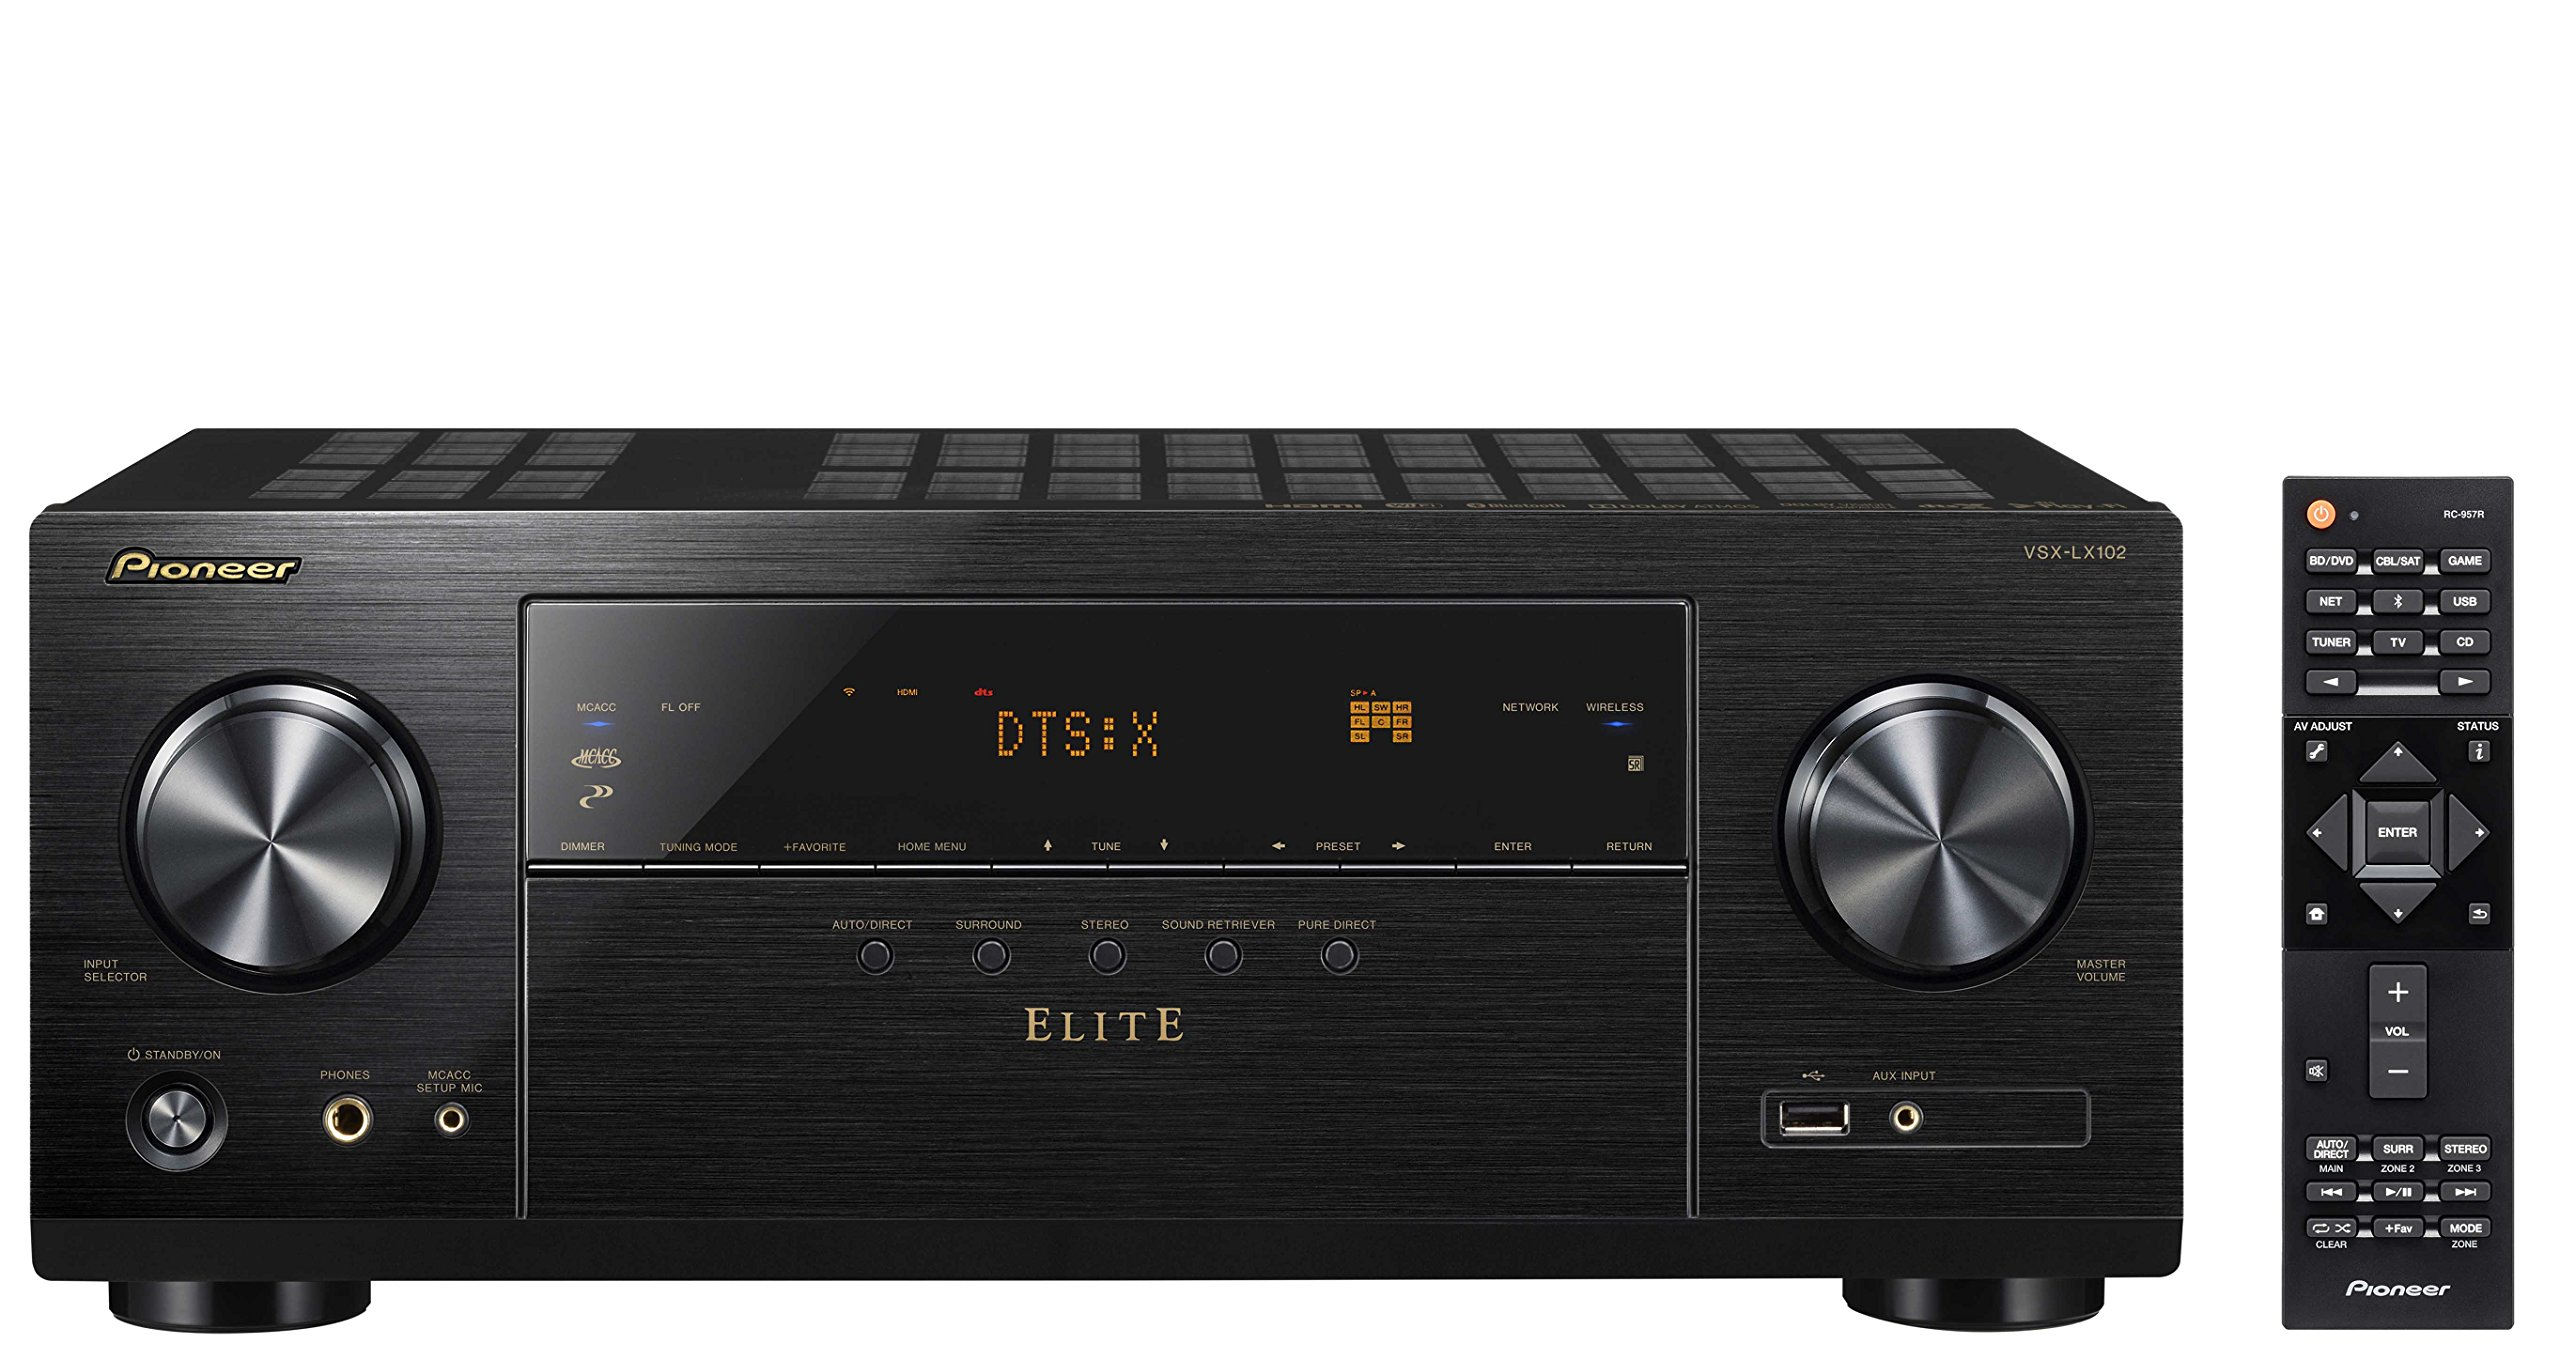 Pioneer Elite Audio & Video Component Receiver black (VSX-LX102)